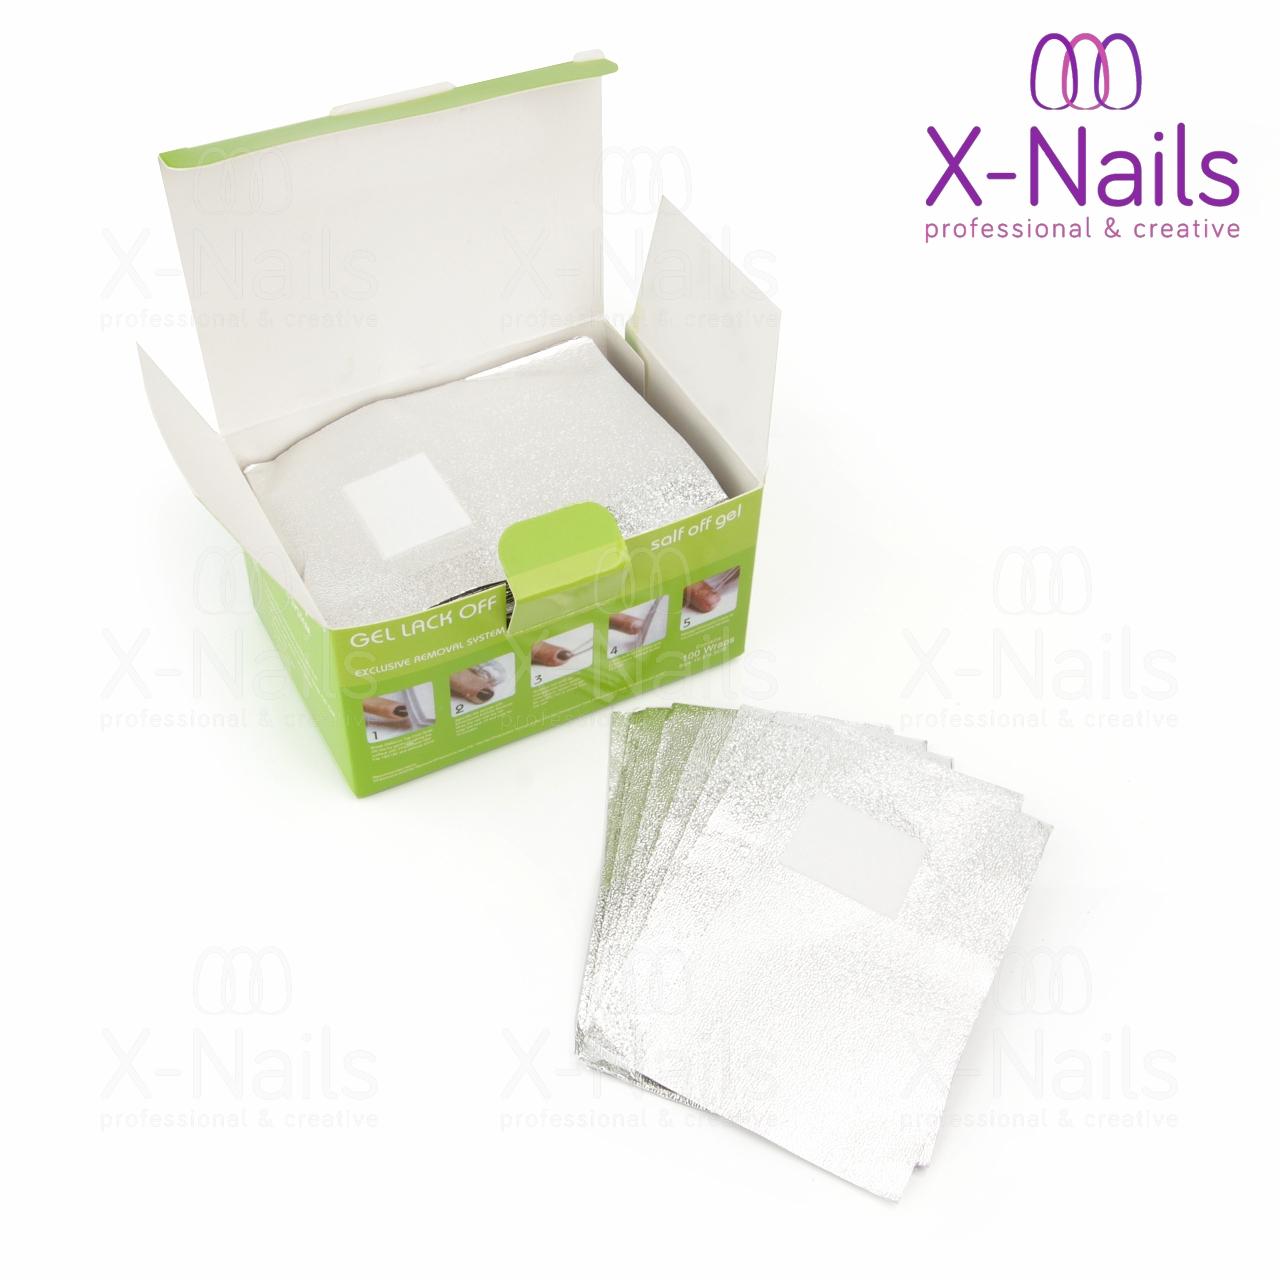 X Nails Folie Pro Odstraneni Gel Laku Gel Lak Folie 100 Ks Remover Foil X Nails Gelove Akrylove Nehty